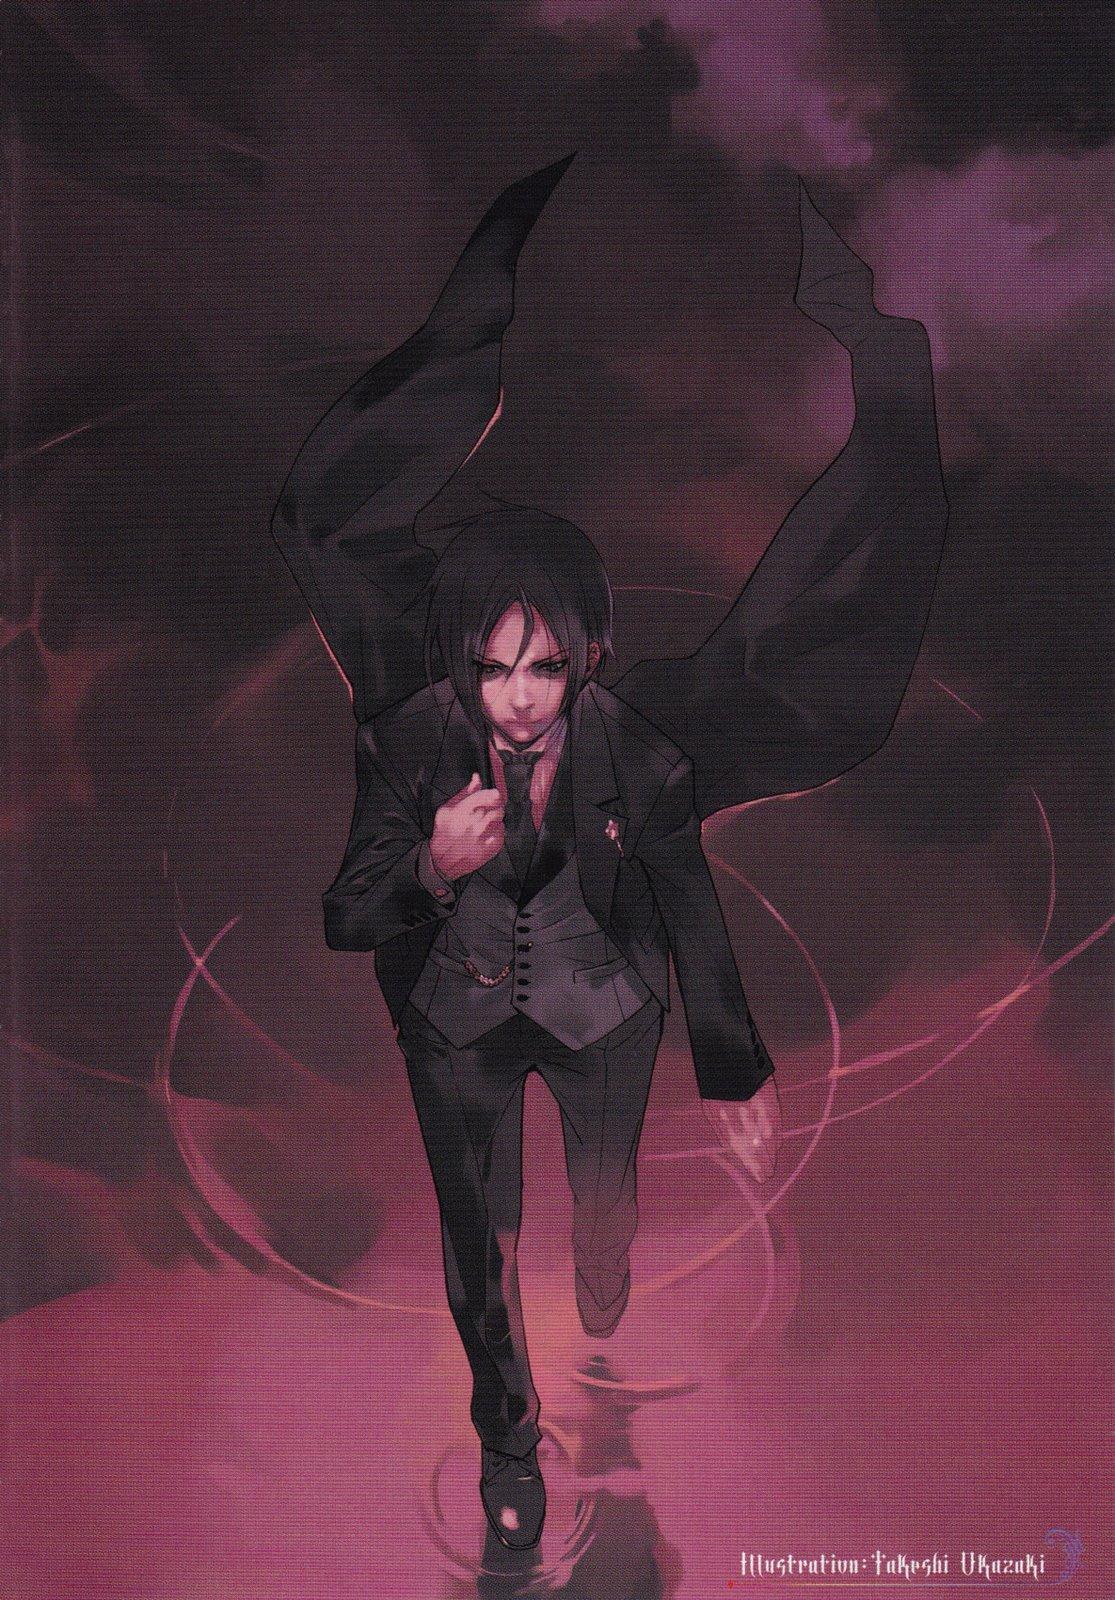 Sebastian michaelis kuroshitsuji mobile wallpaper 140903 zerochan anime image board - Mobel michaelis ...